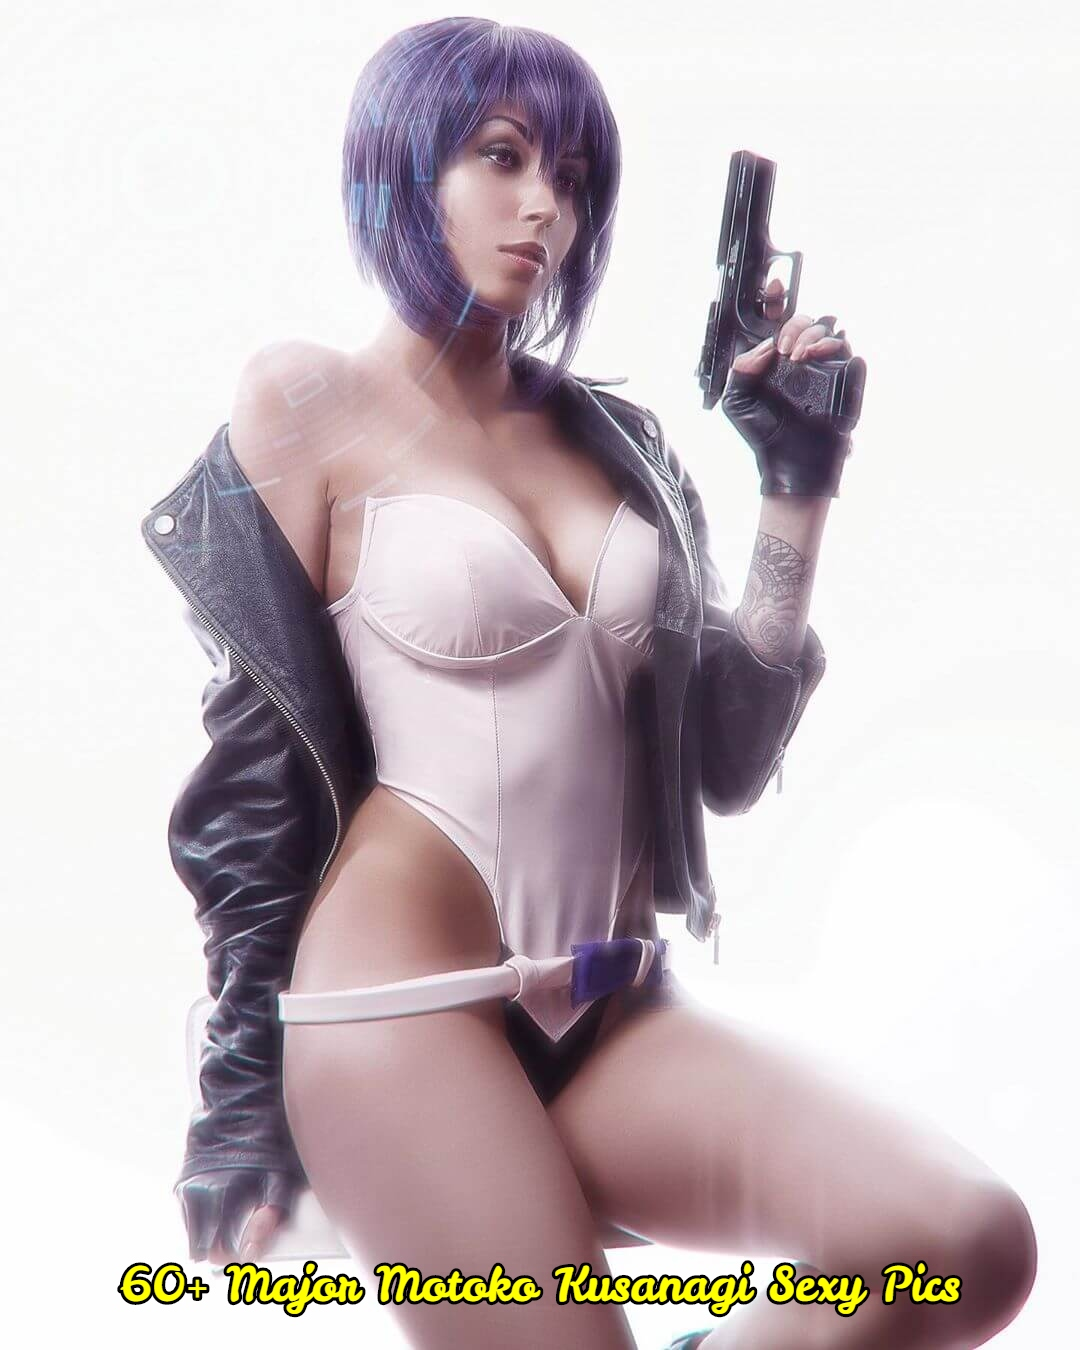 Major Motoko Kusanagi sexy pictures